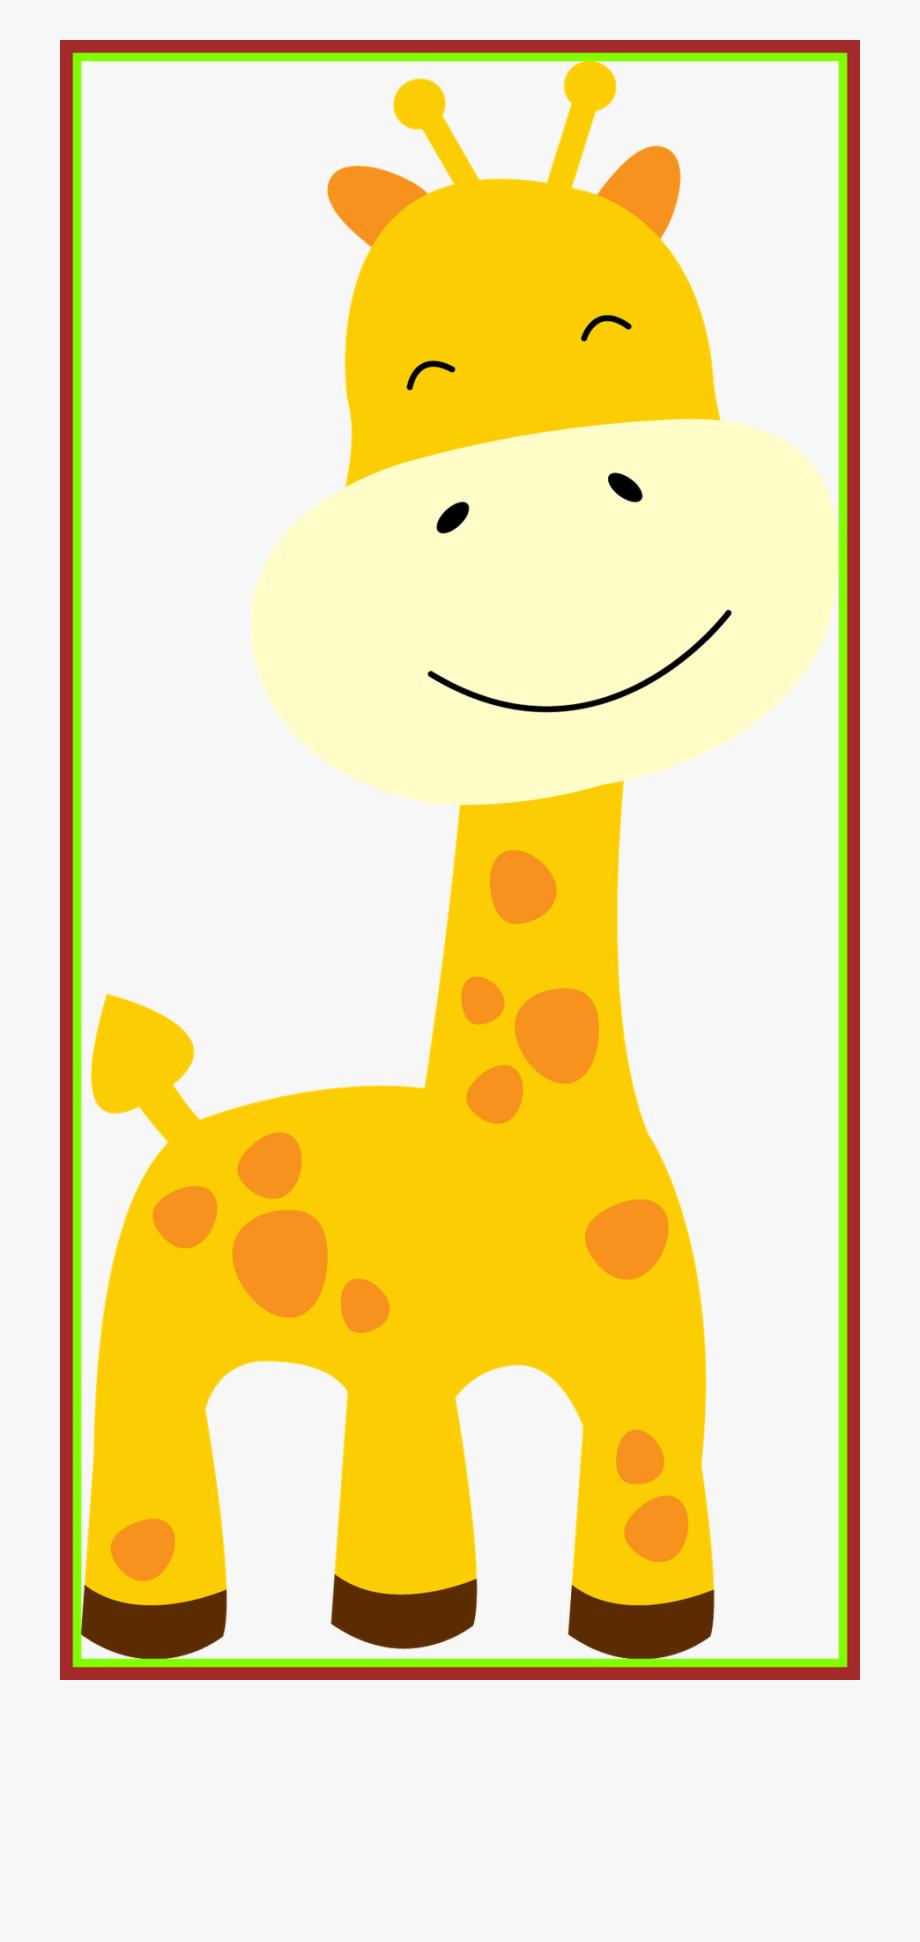 Incredible giraffe for.